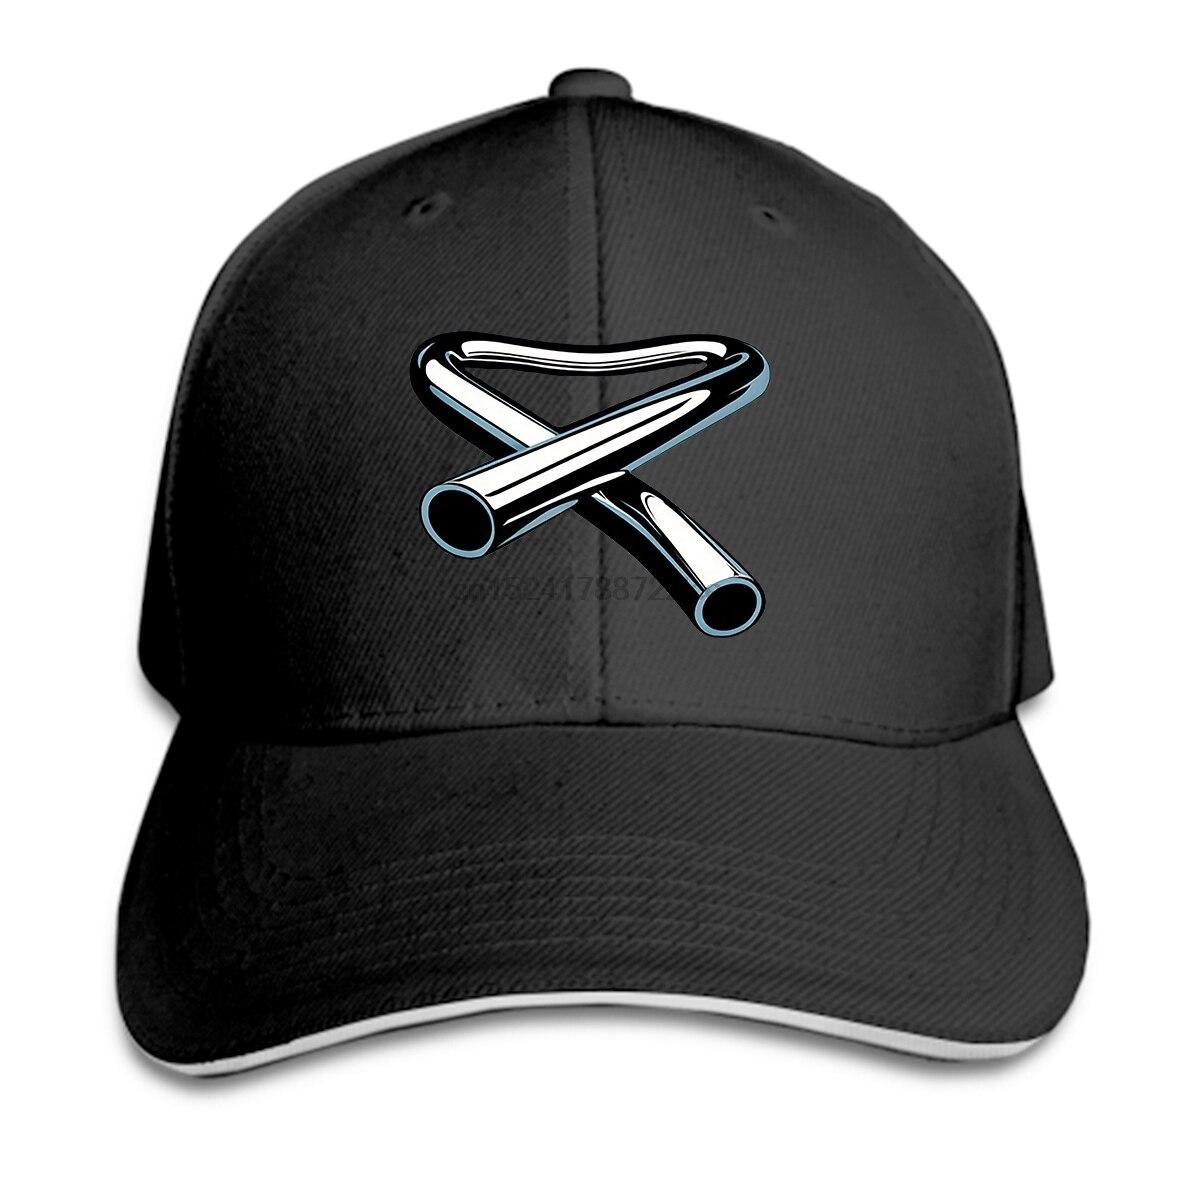 Print Custom Baseball Cap Tubular Bells Music Mike Oldfield Retro Music Rock Album Premium Hat Peaked cap